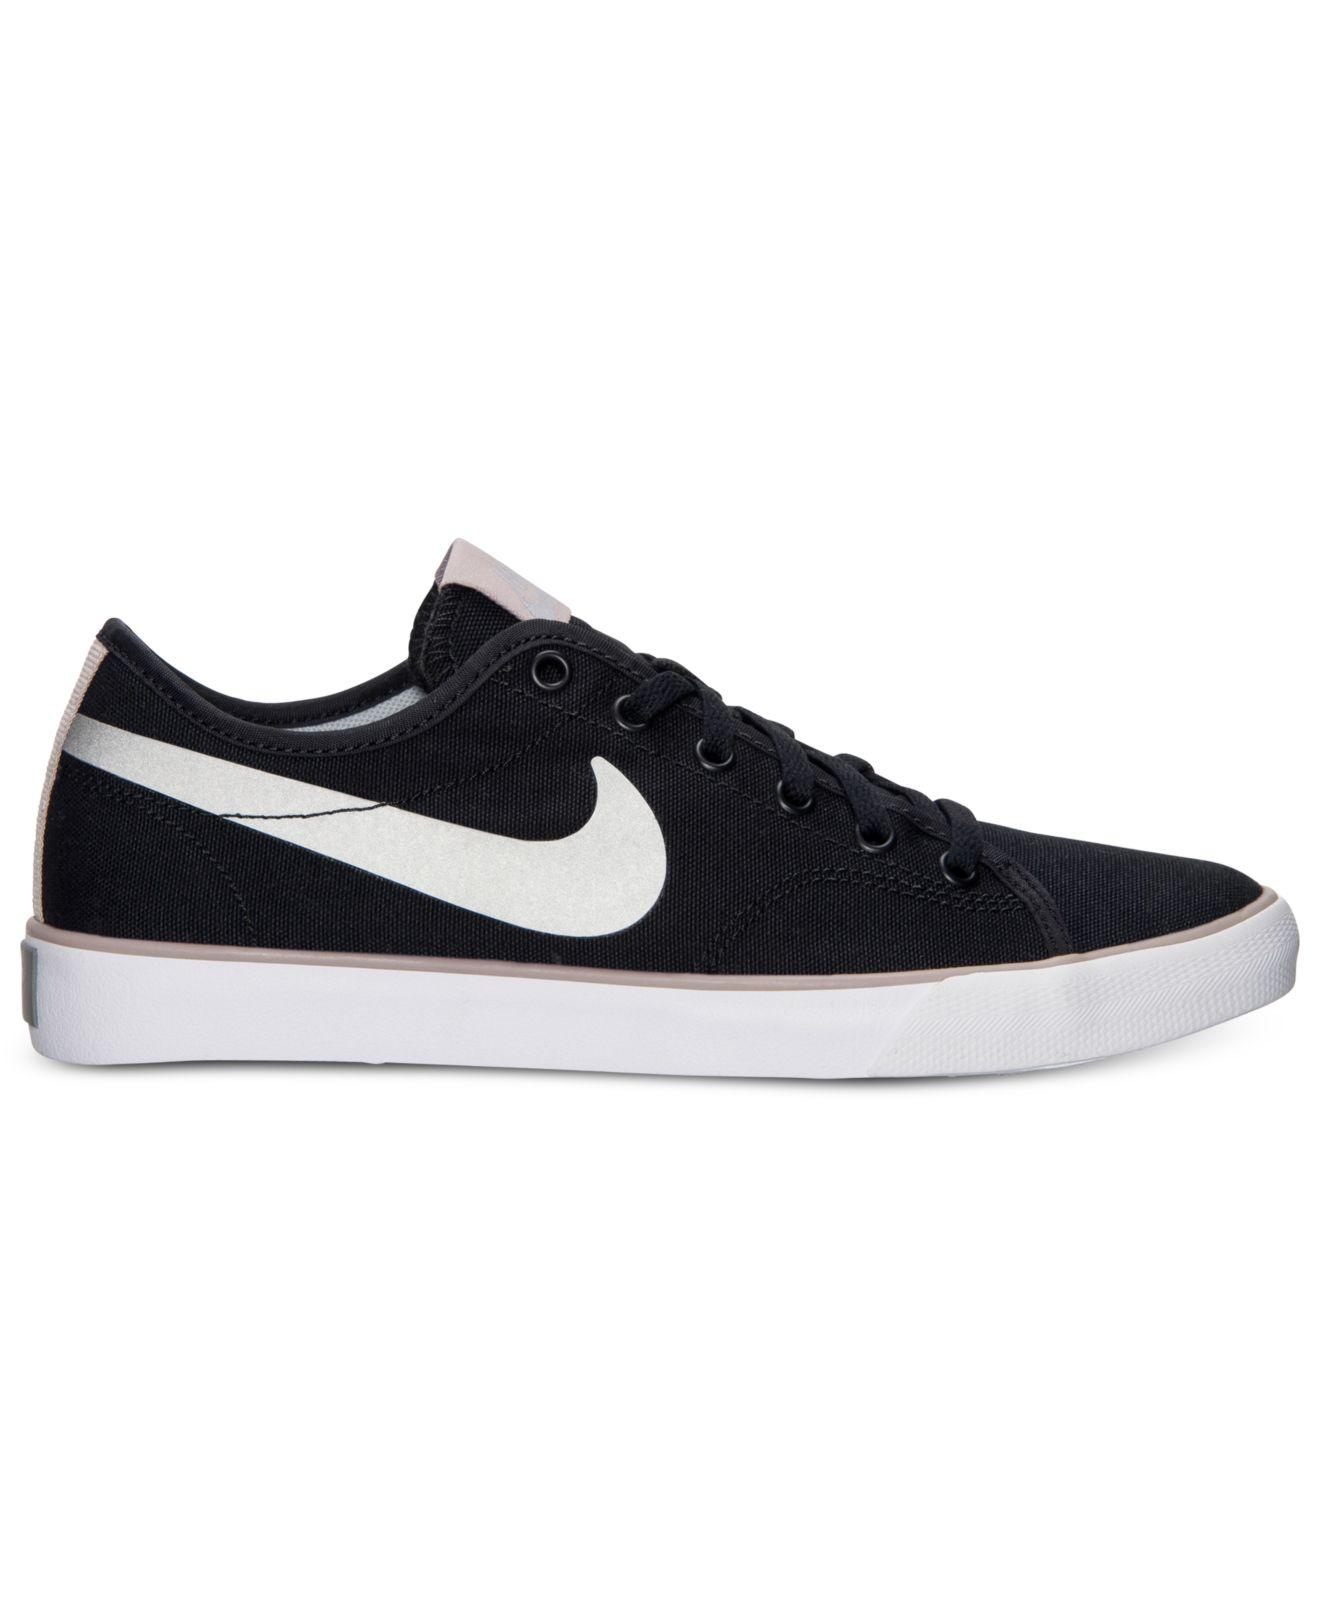 Nike Primo Court Black Canvas Shoes  Women